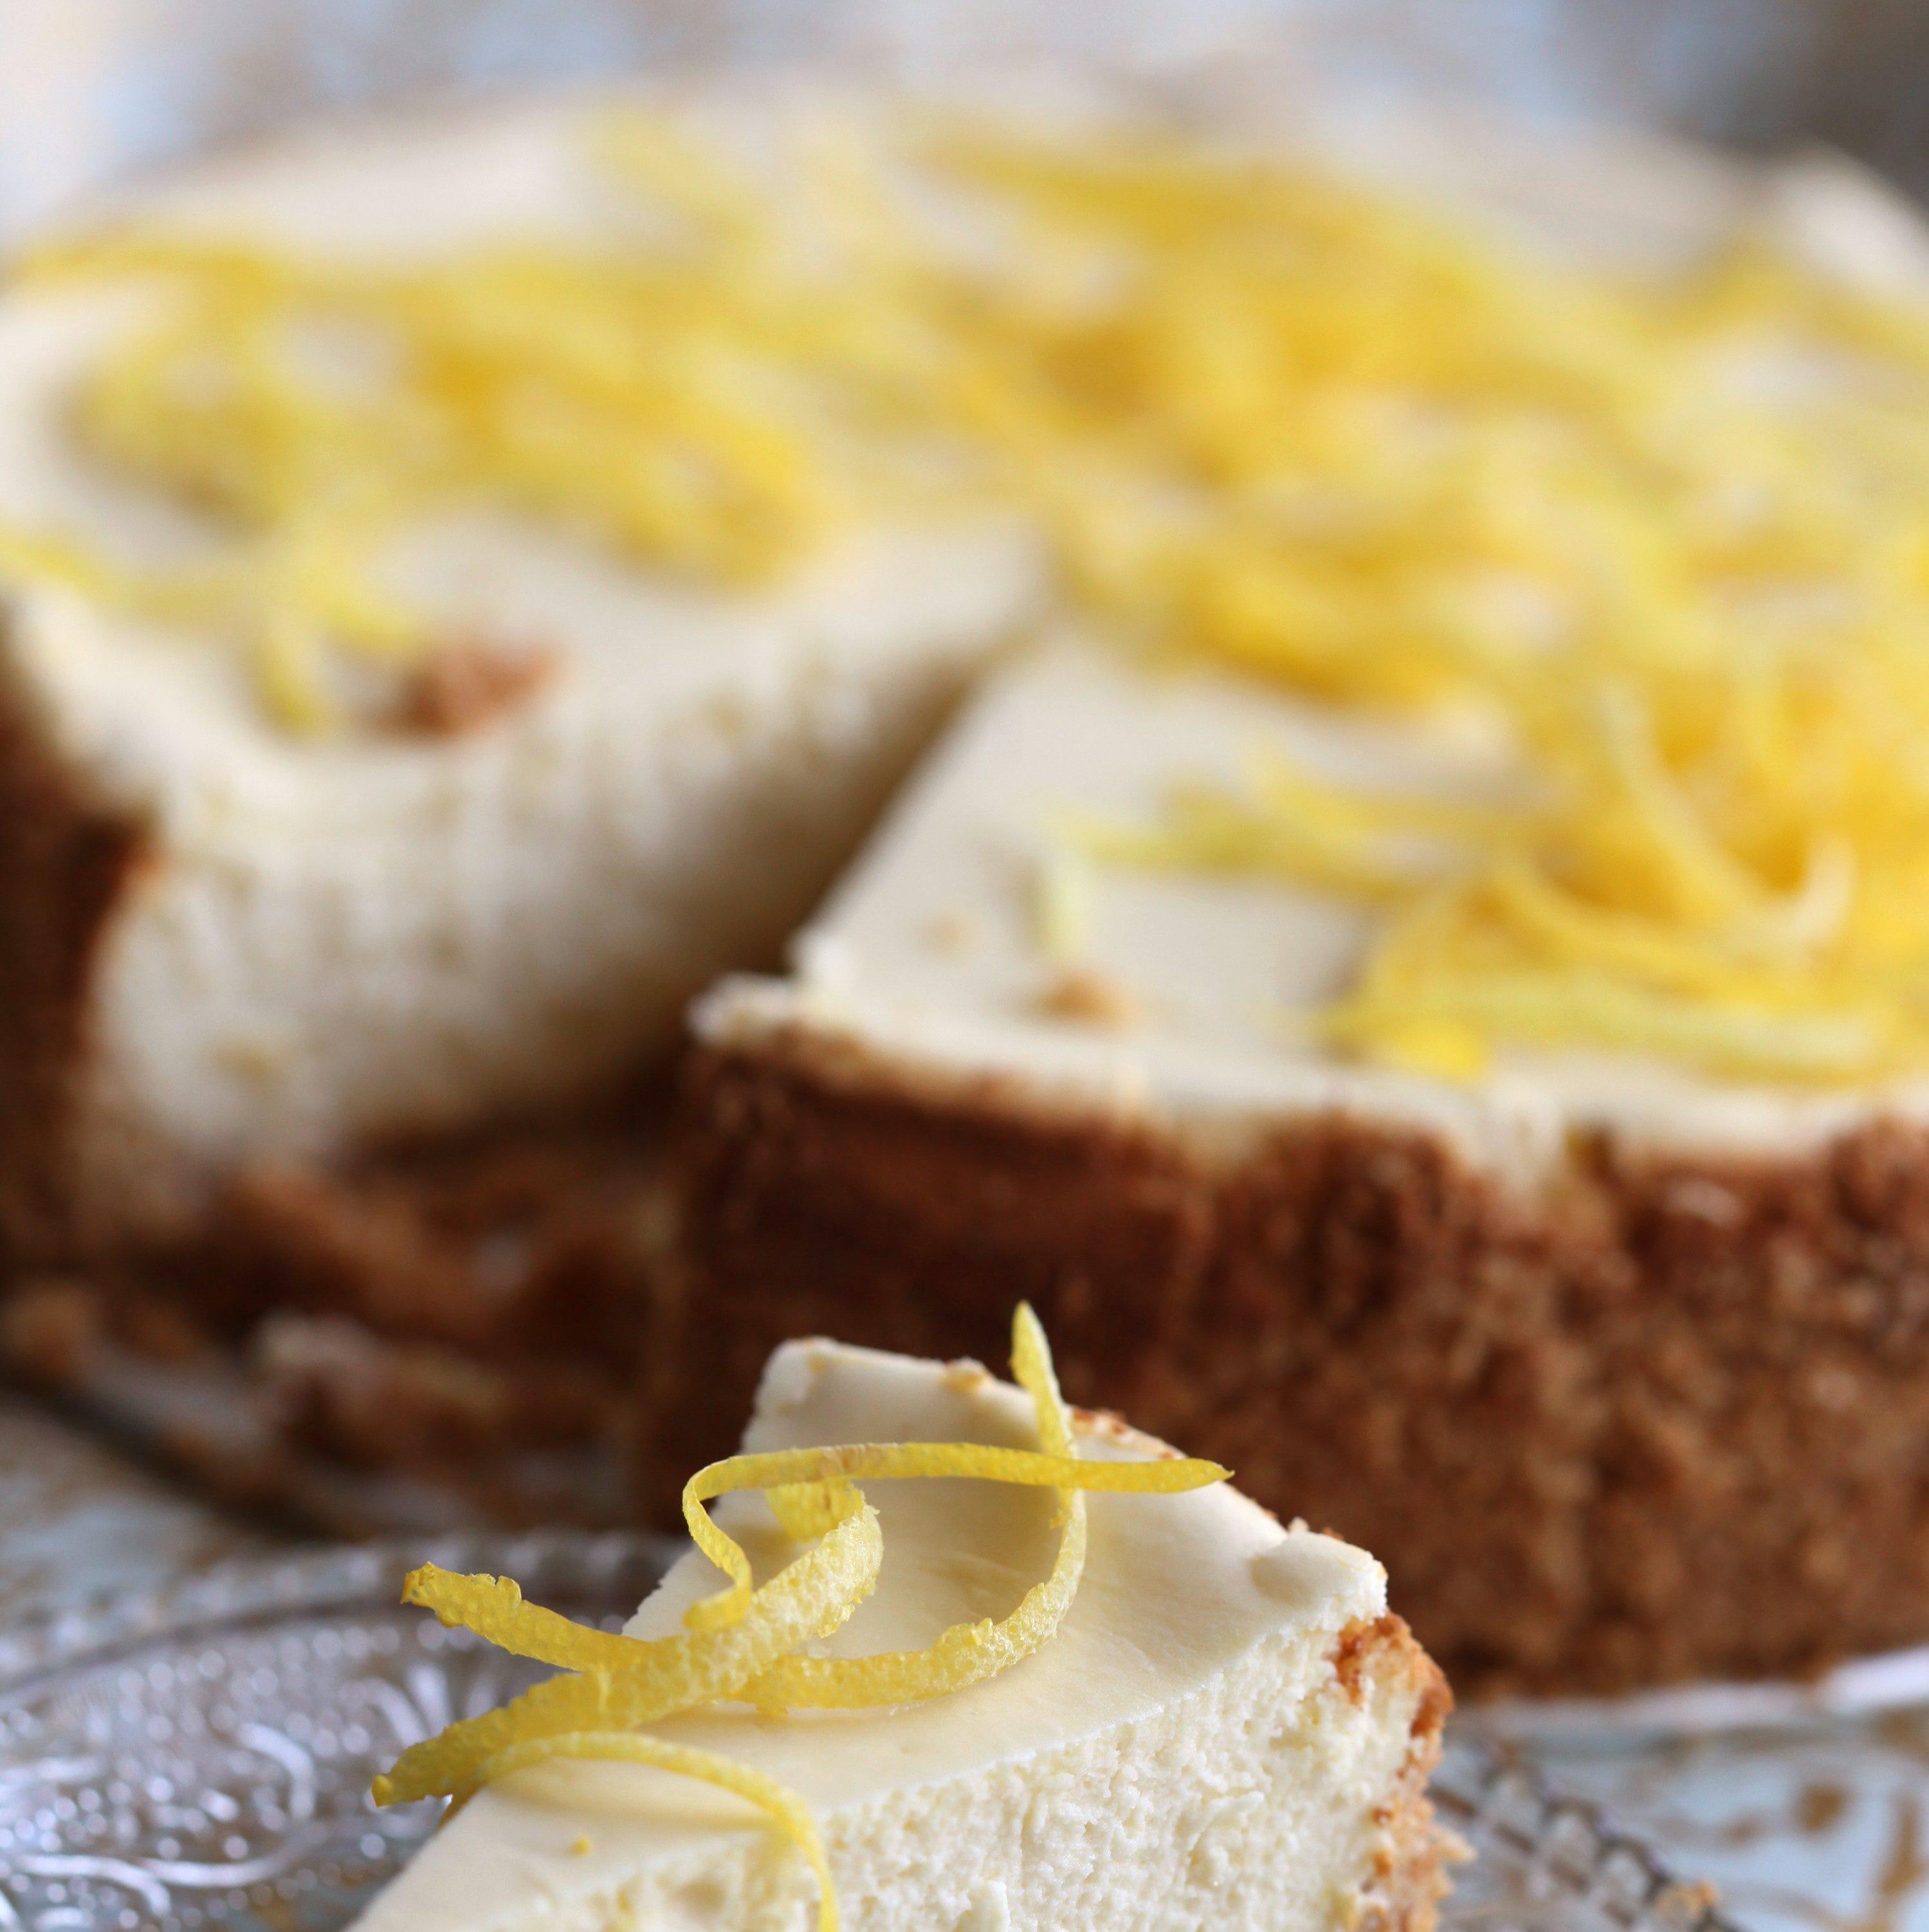 Recipe: Lemon cheesecake is perfect Passover dessert